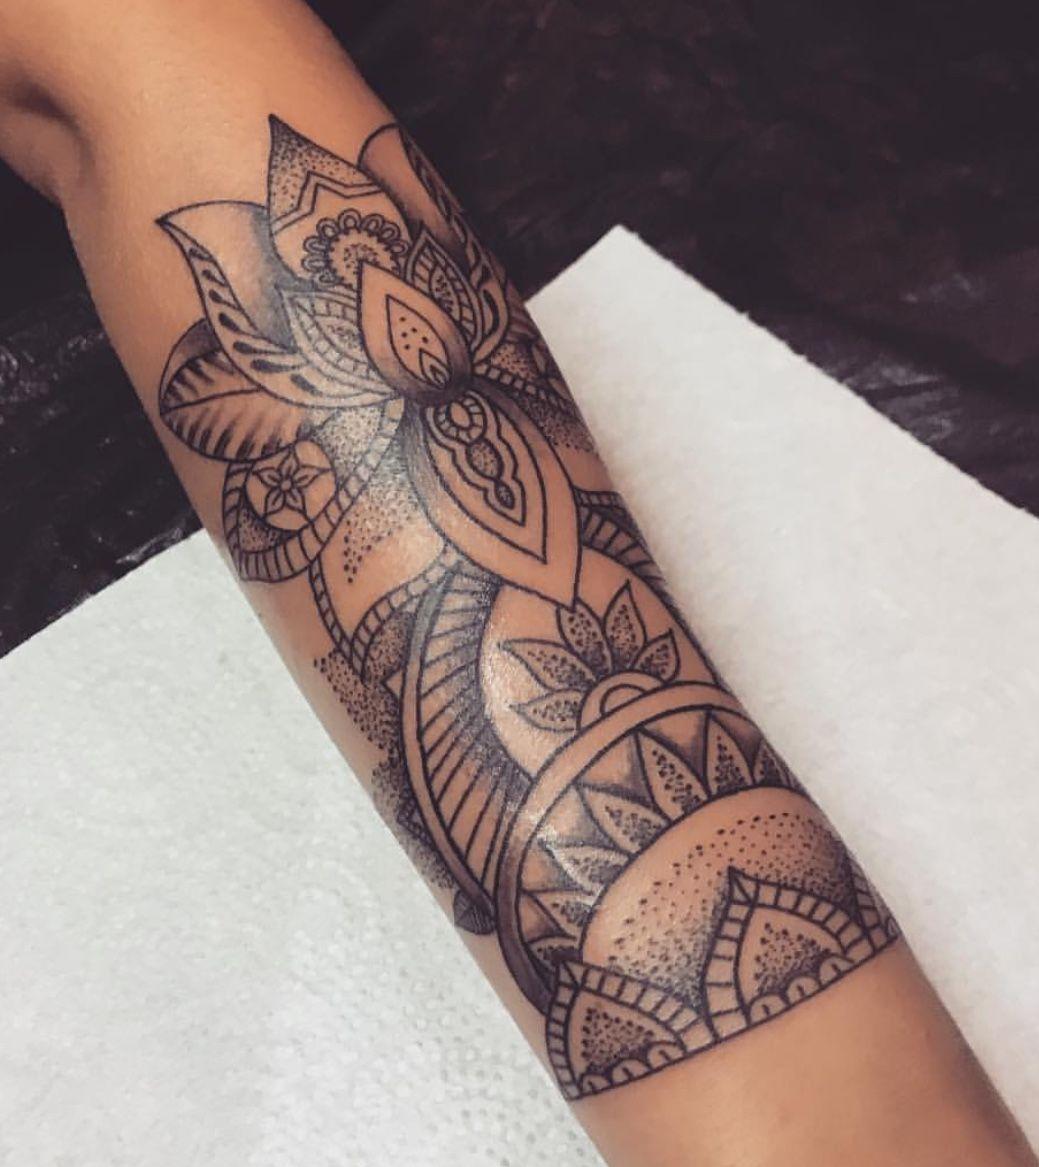 Pin By Nezihe Altunbasak On Tattoo Half Sleeve Tattoo Forearm Tattoos Sleeve Tattoos